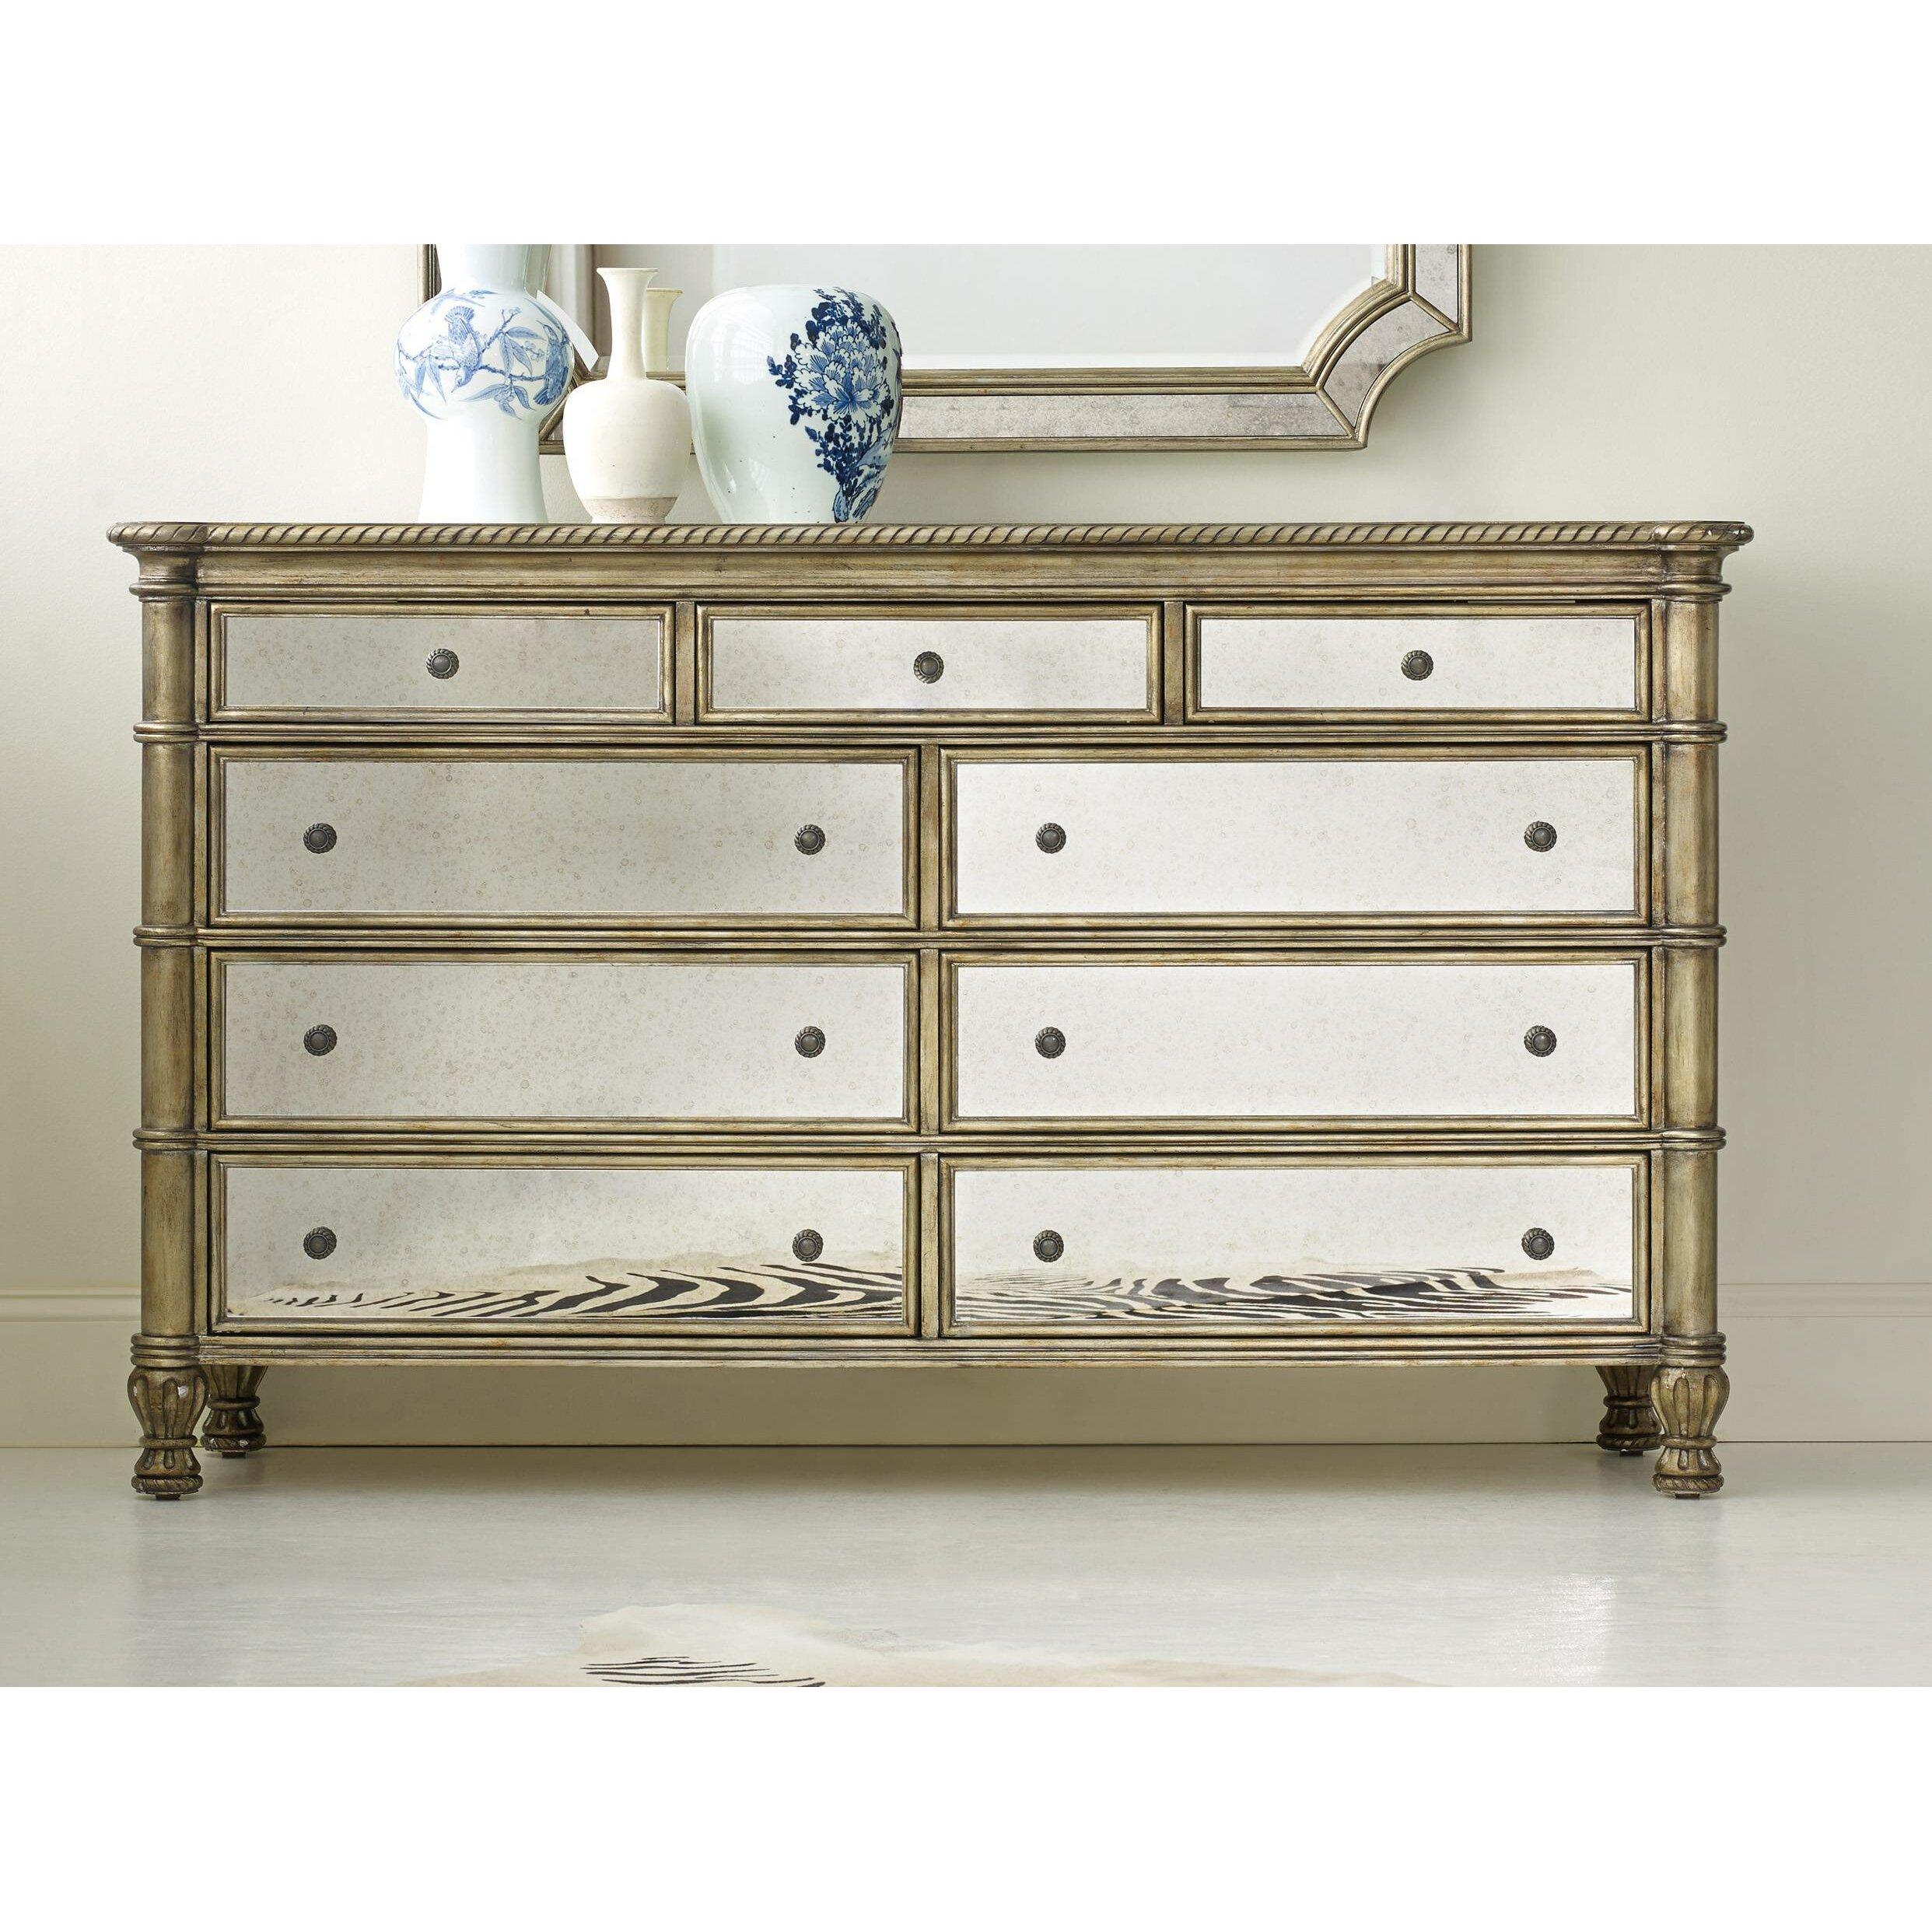 Hooker Furniture Melange Canopy Customizable Bedroom Set & Reviews